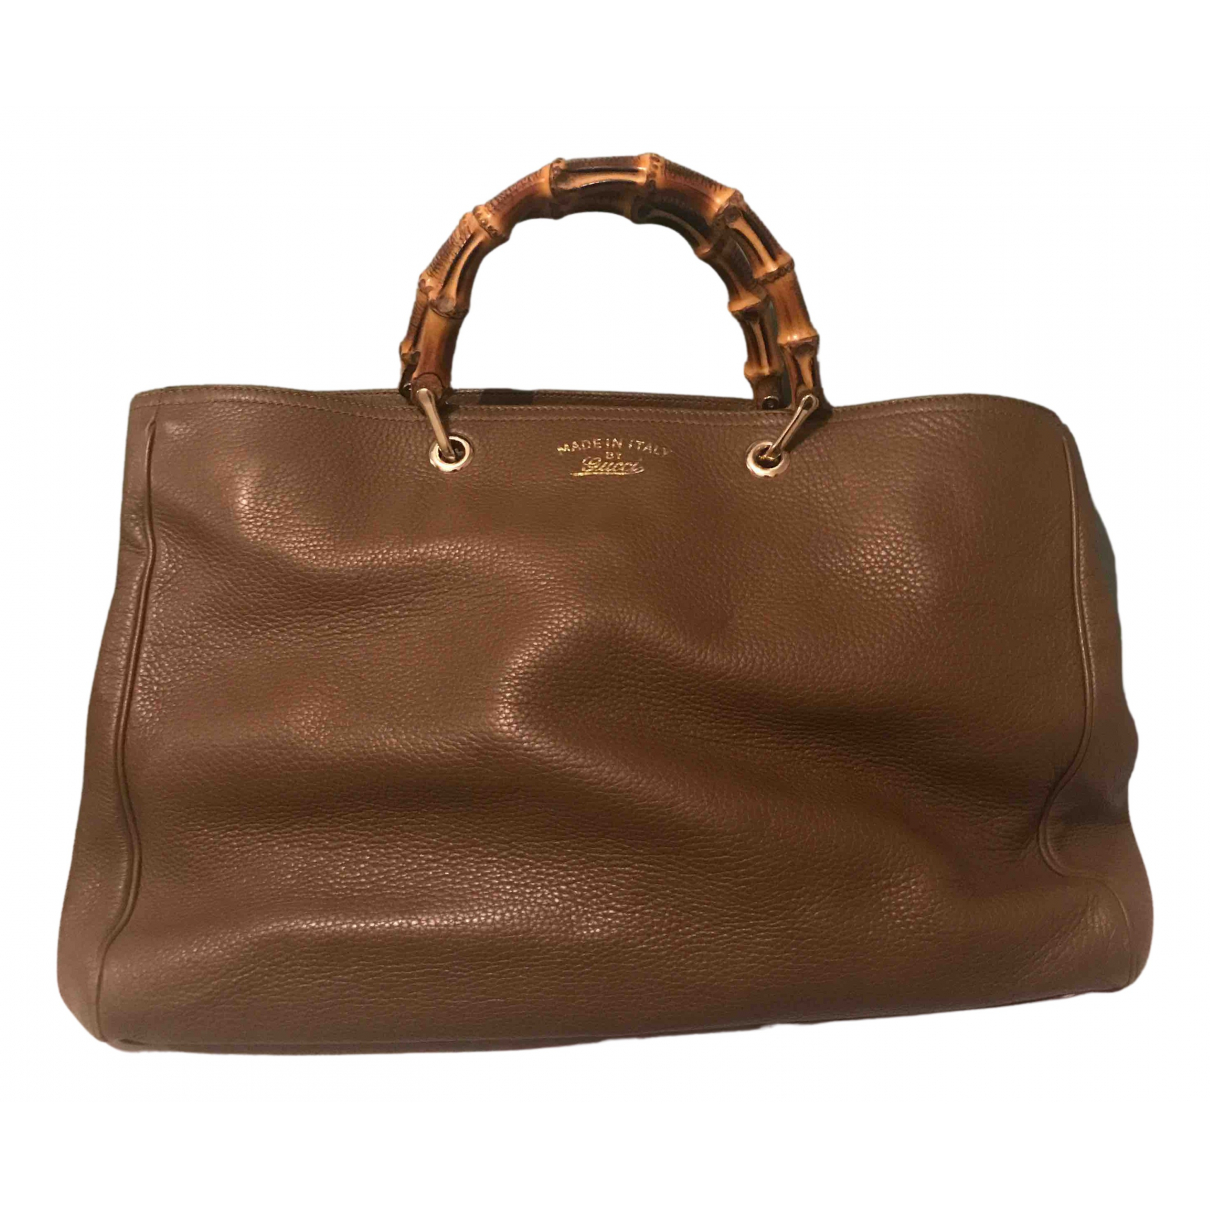 Gucci Bamboo Beige Leather handbag for Women N